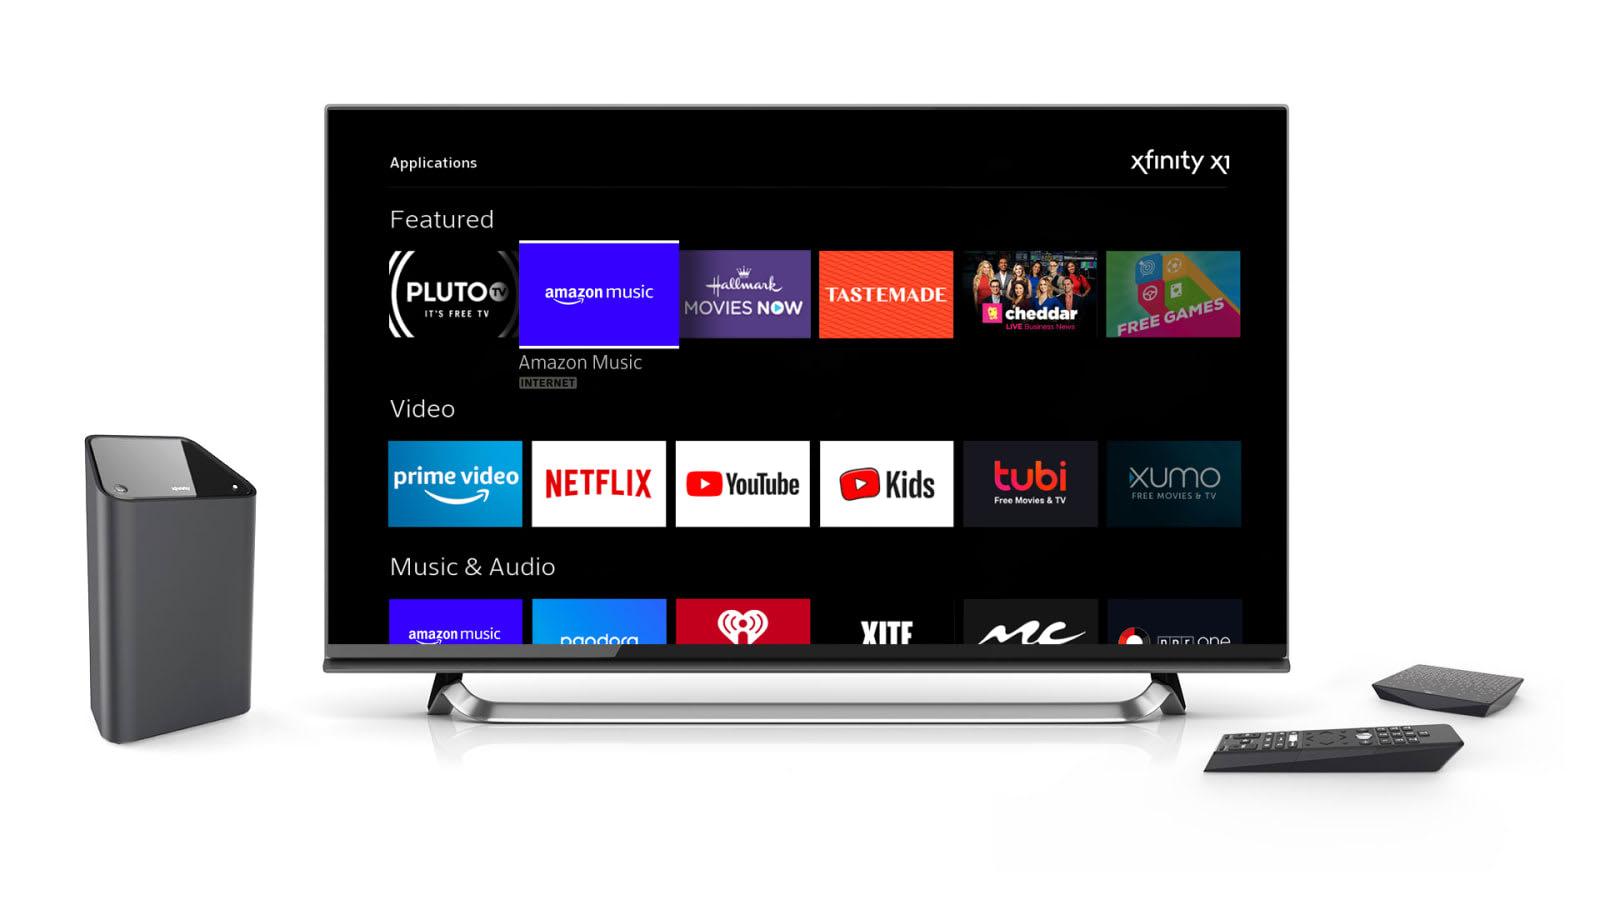 Comcast is bringing Amazon Music to Xfinity X1 and Flex